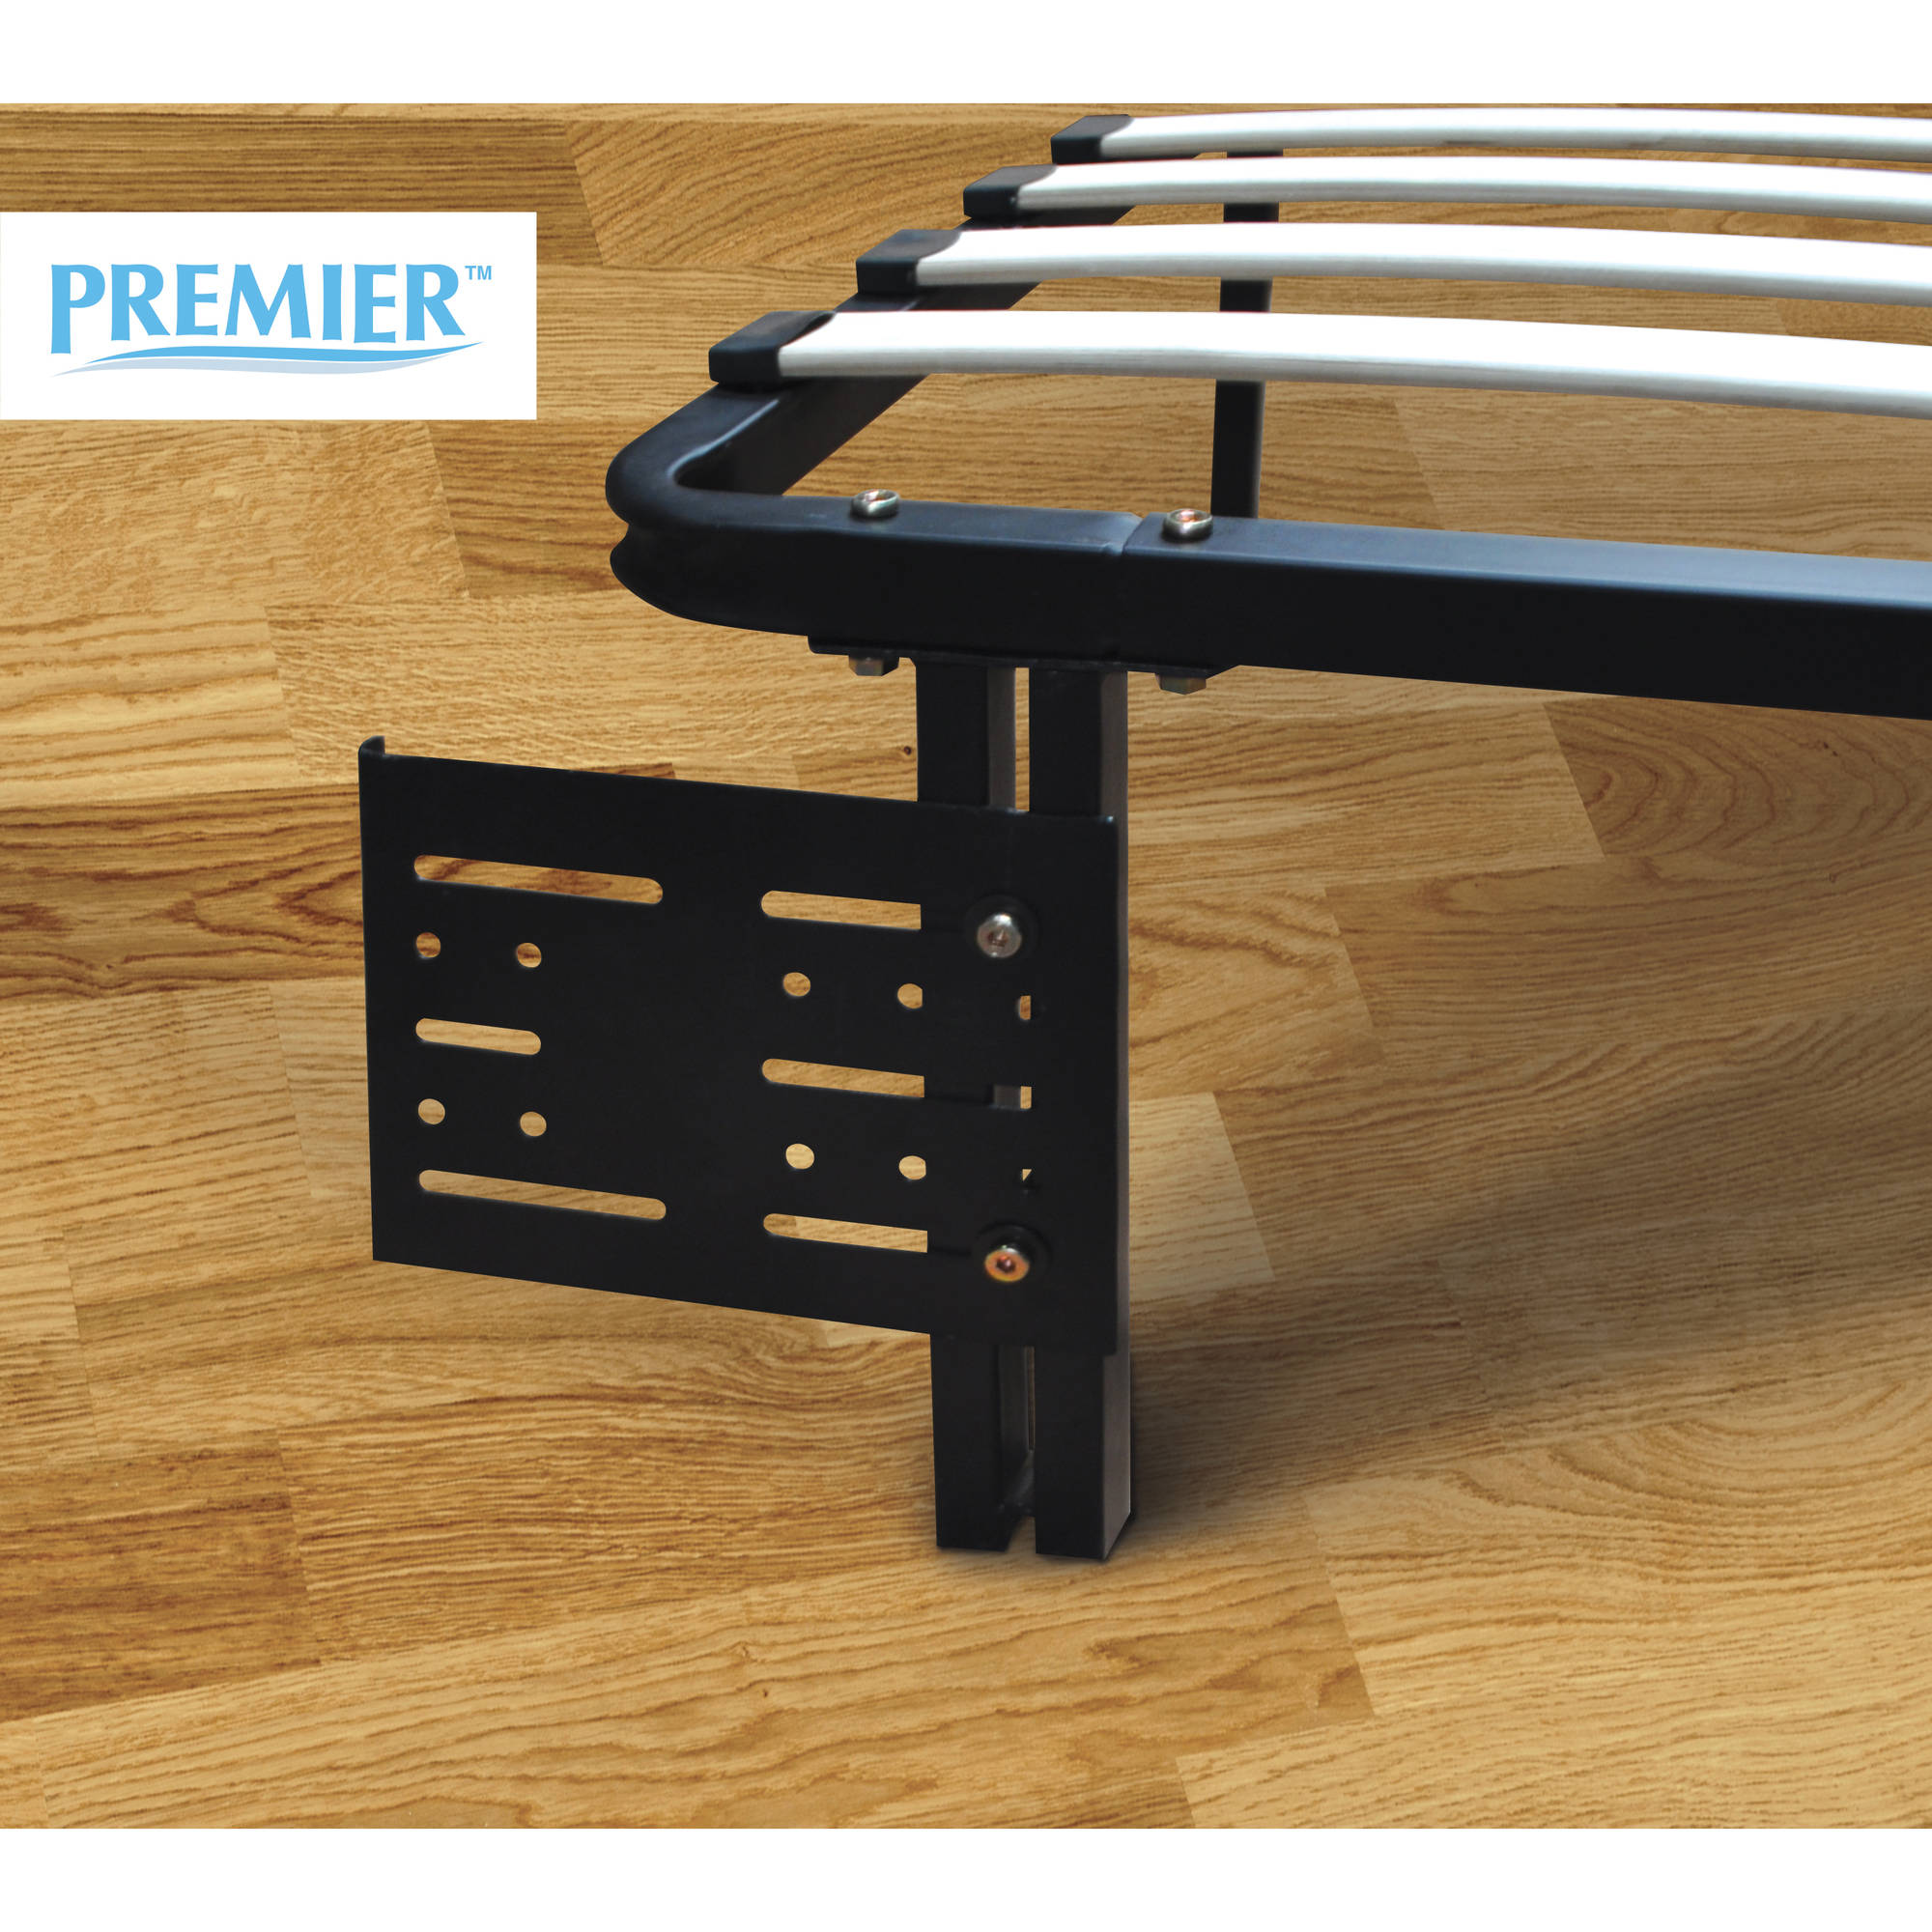 Premier Flex Headboard Footboard Brackets Black Walmart Com Walmart Com